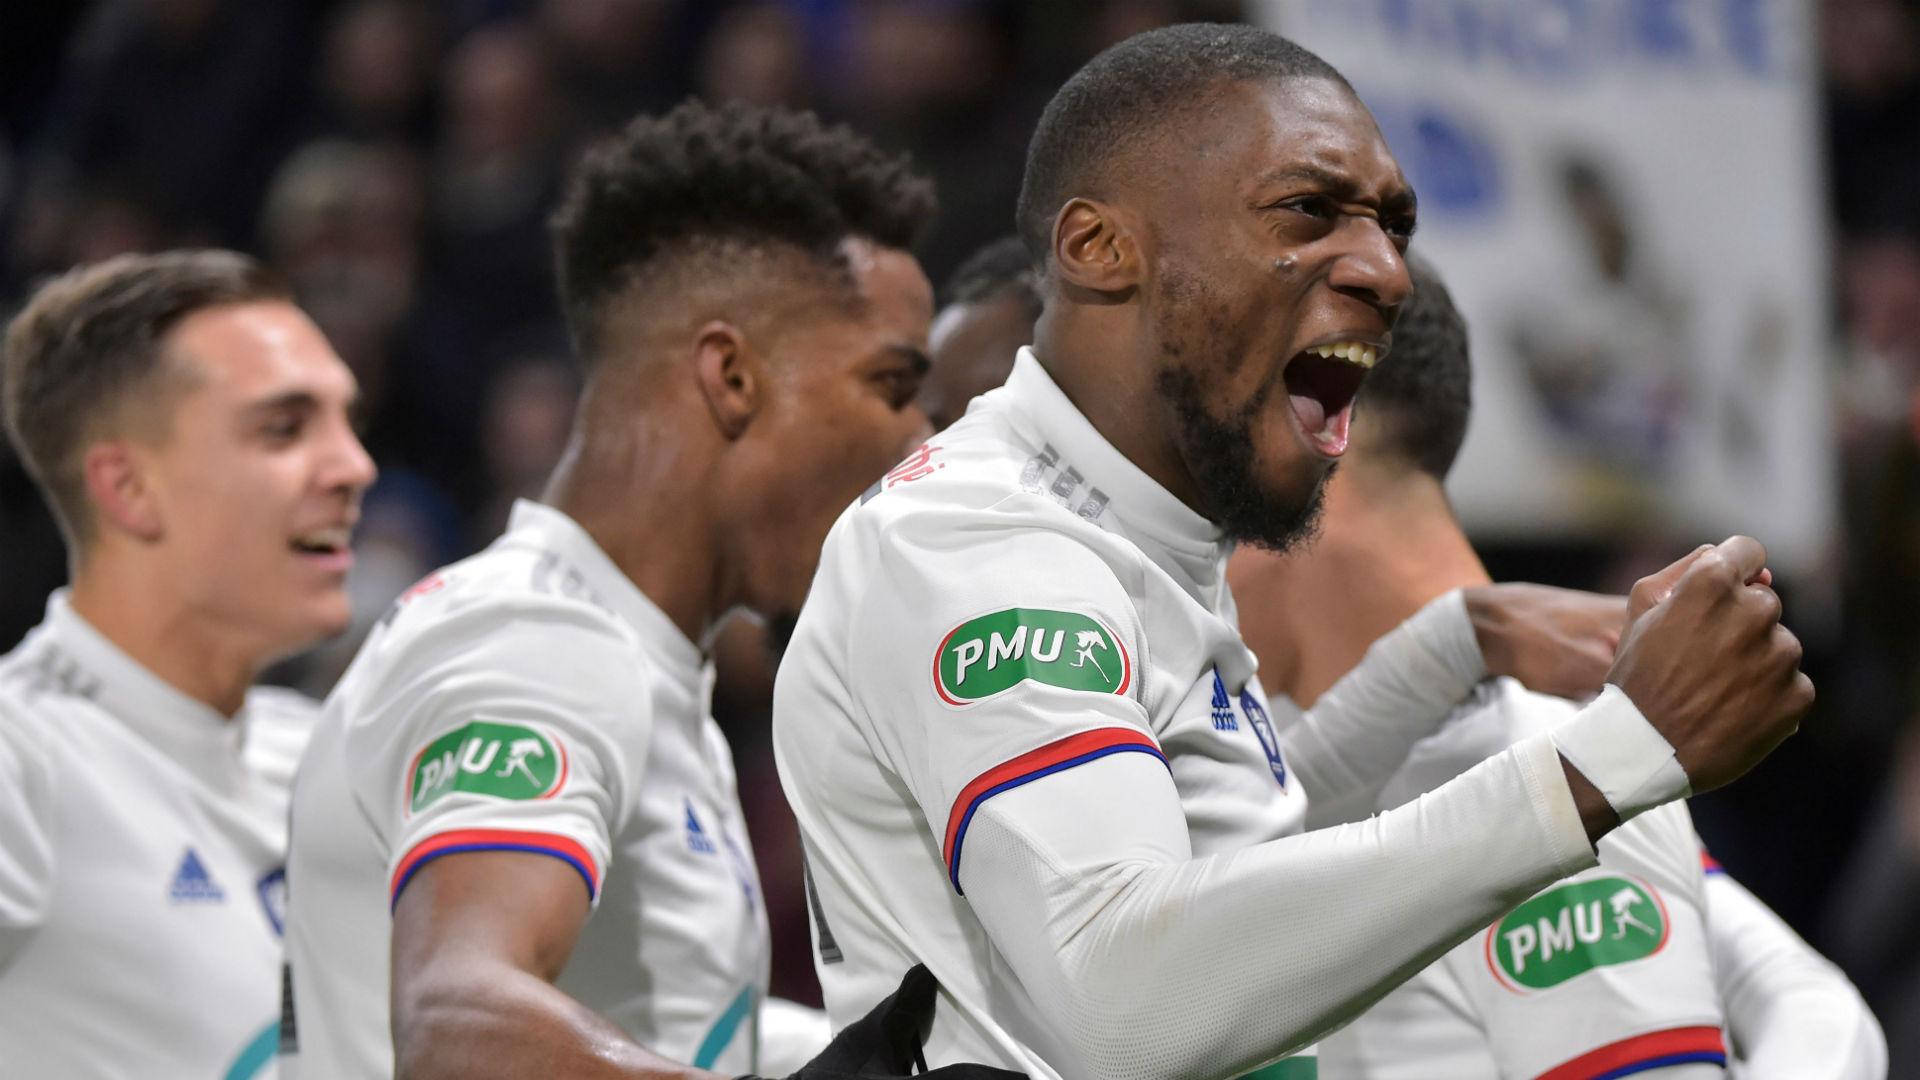 Toko Ekambi bags brace, Kadewere and Aholou score as Lyon edge past Strasbourg